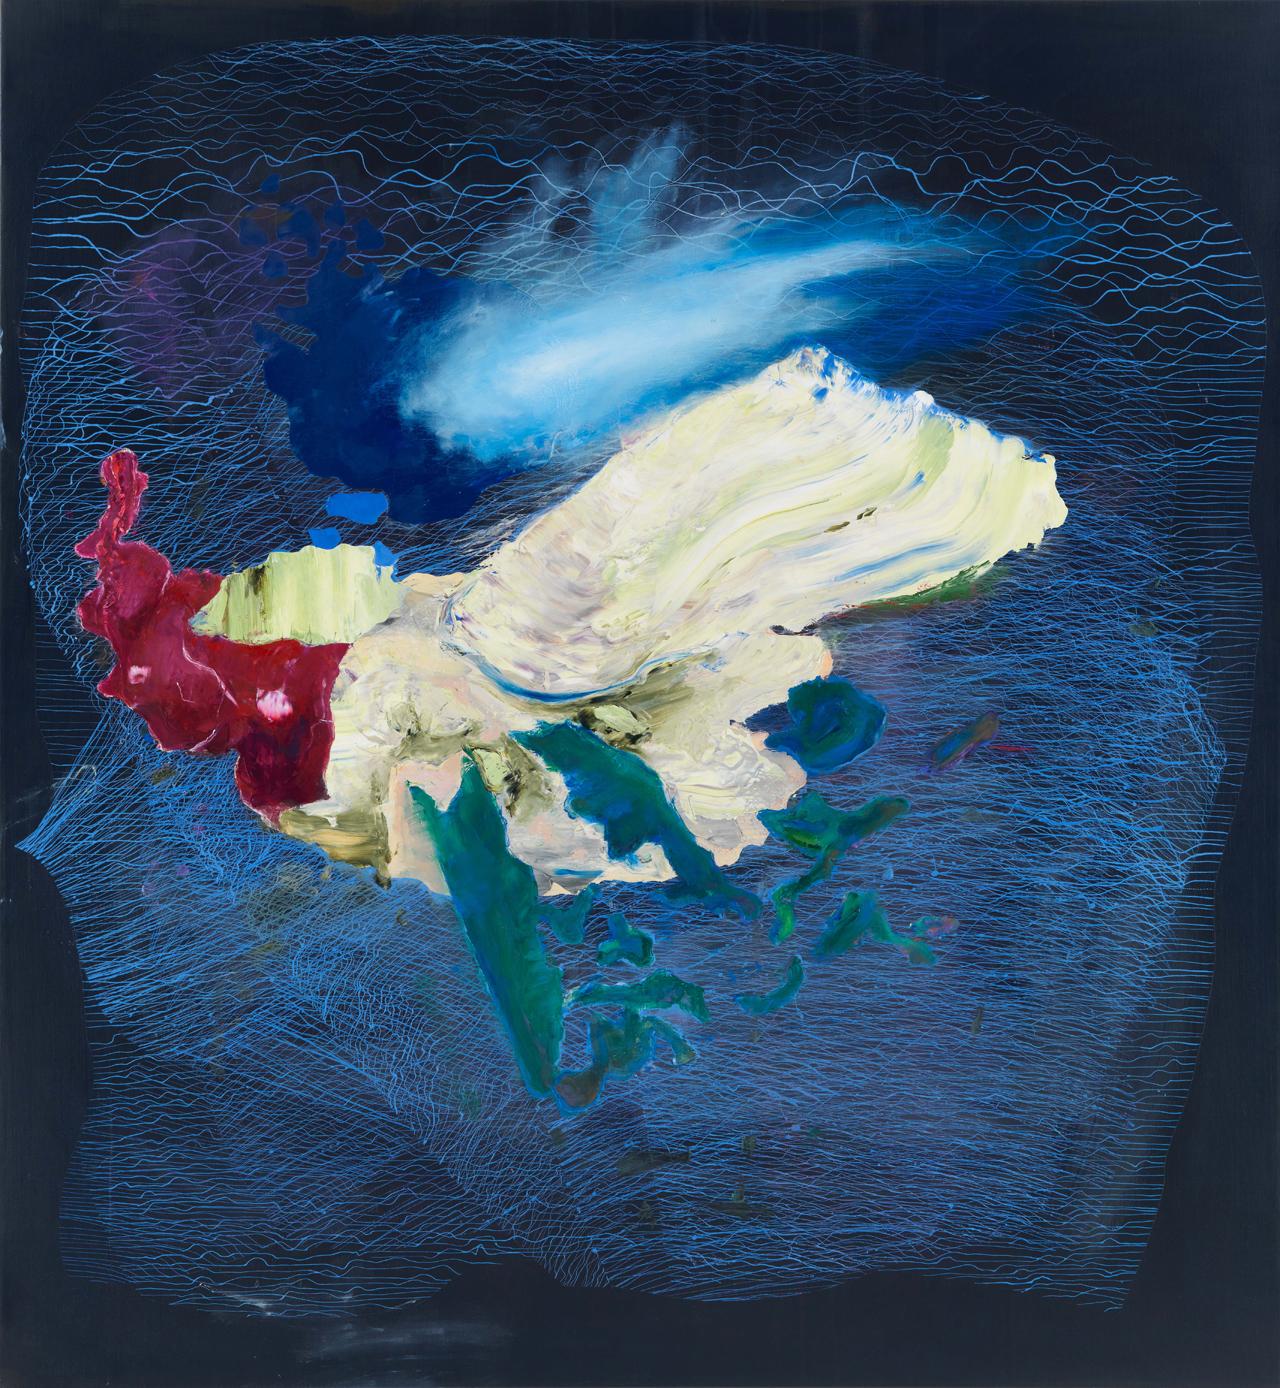 Frank Wiebe, Outpost Mappings #019, 2019, Öl auf Leinwand, 135 x 125 cm